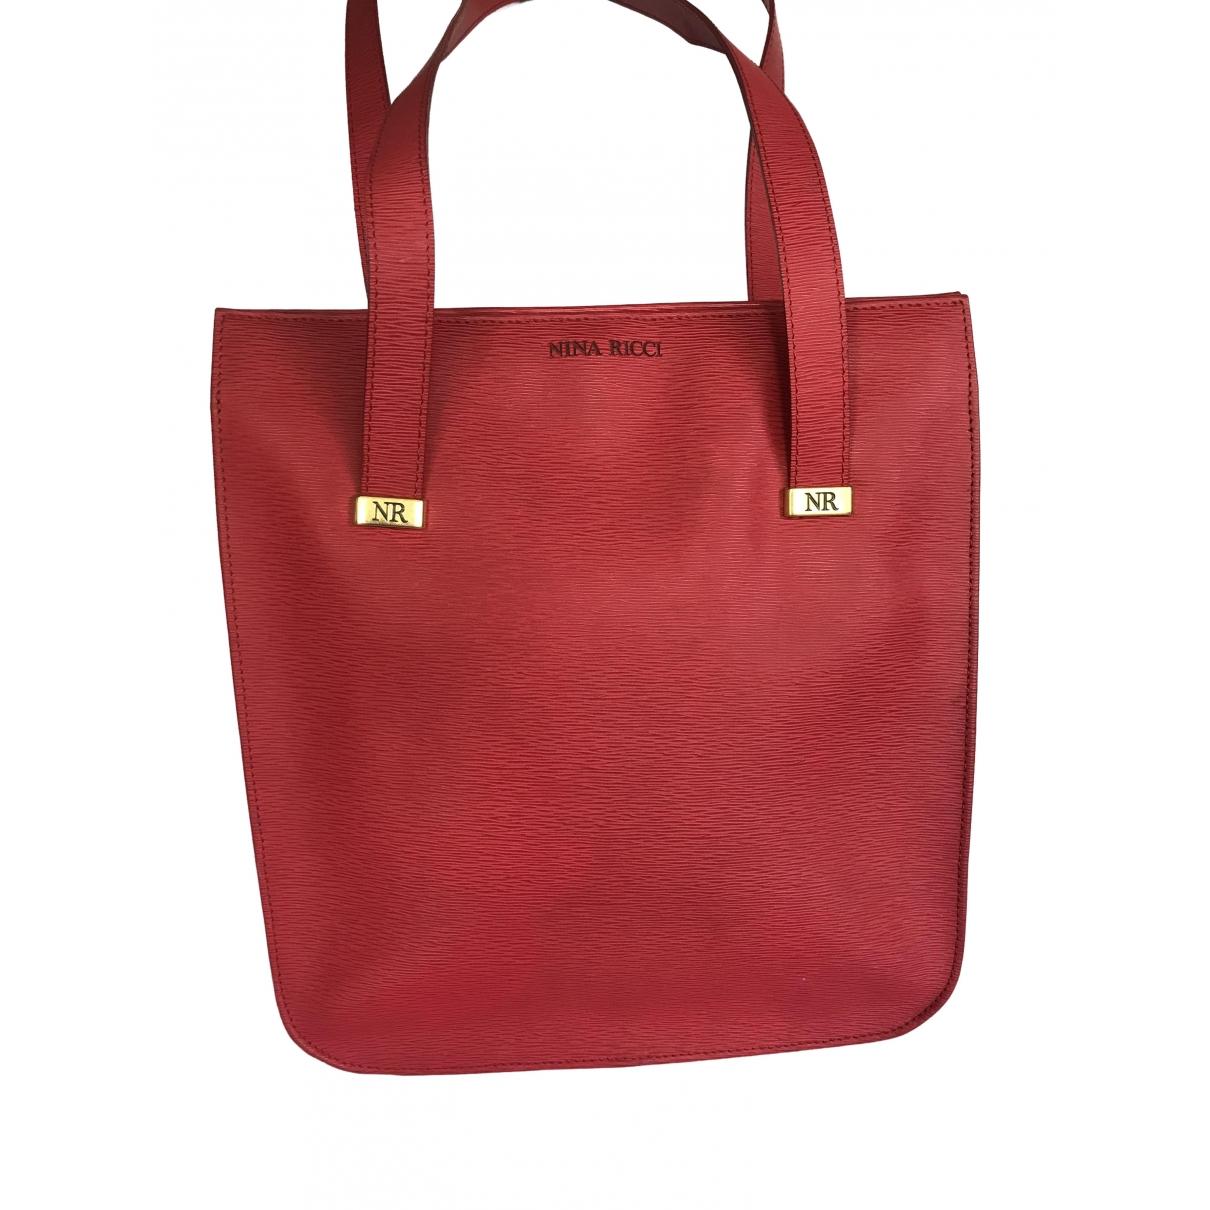 Nina Ricci \N Red Leather handbag for Women \N